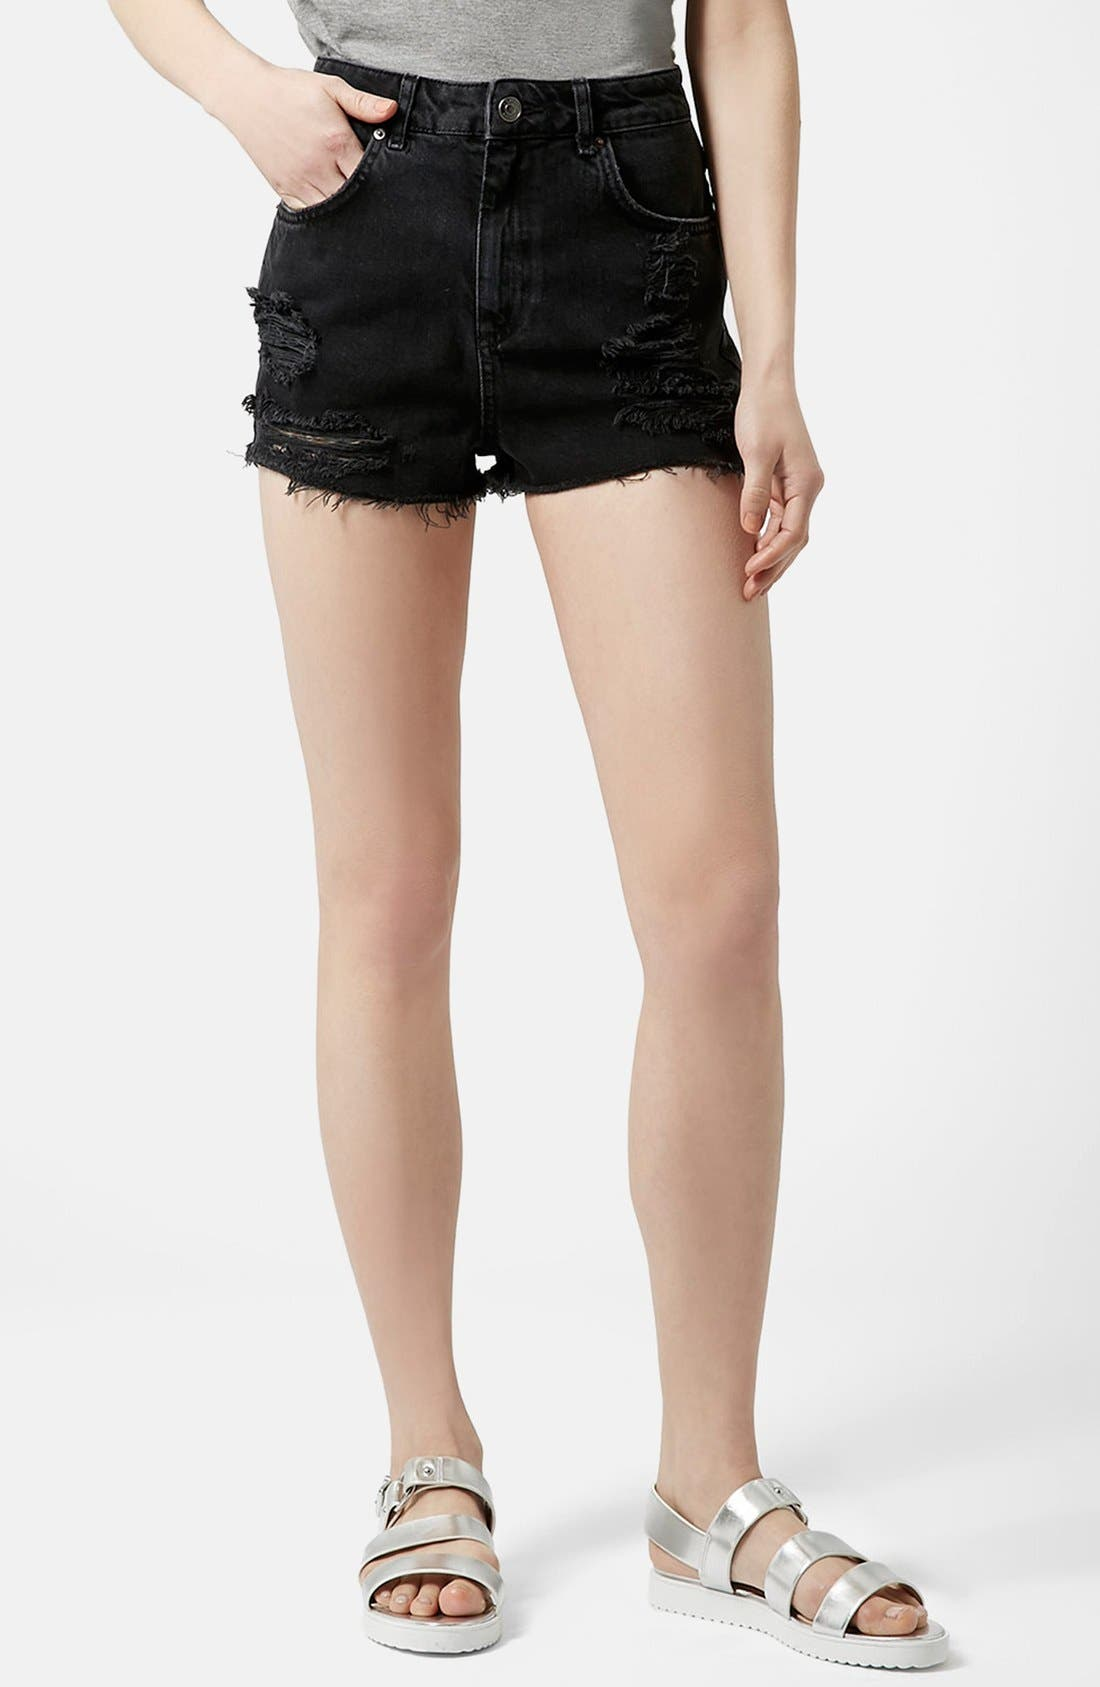 Alternate Image 1 Selected - Topshop Moto Ripped Shorts (Black)